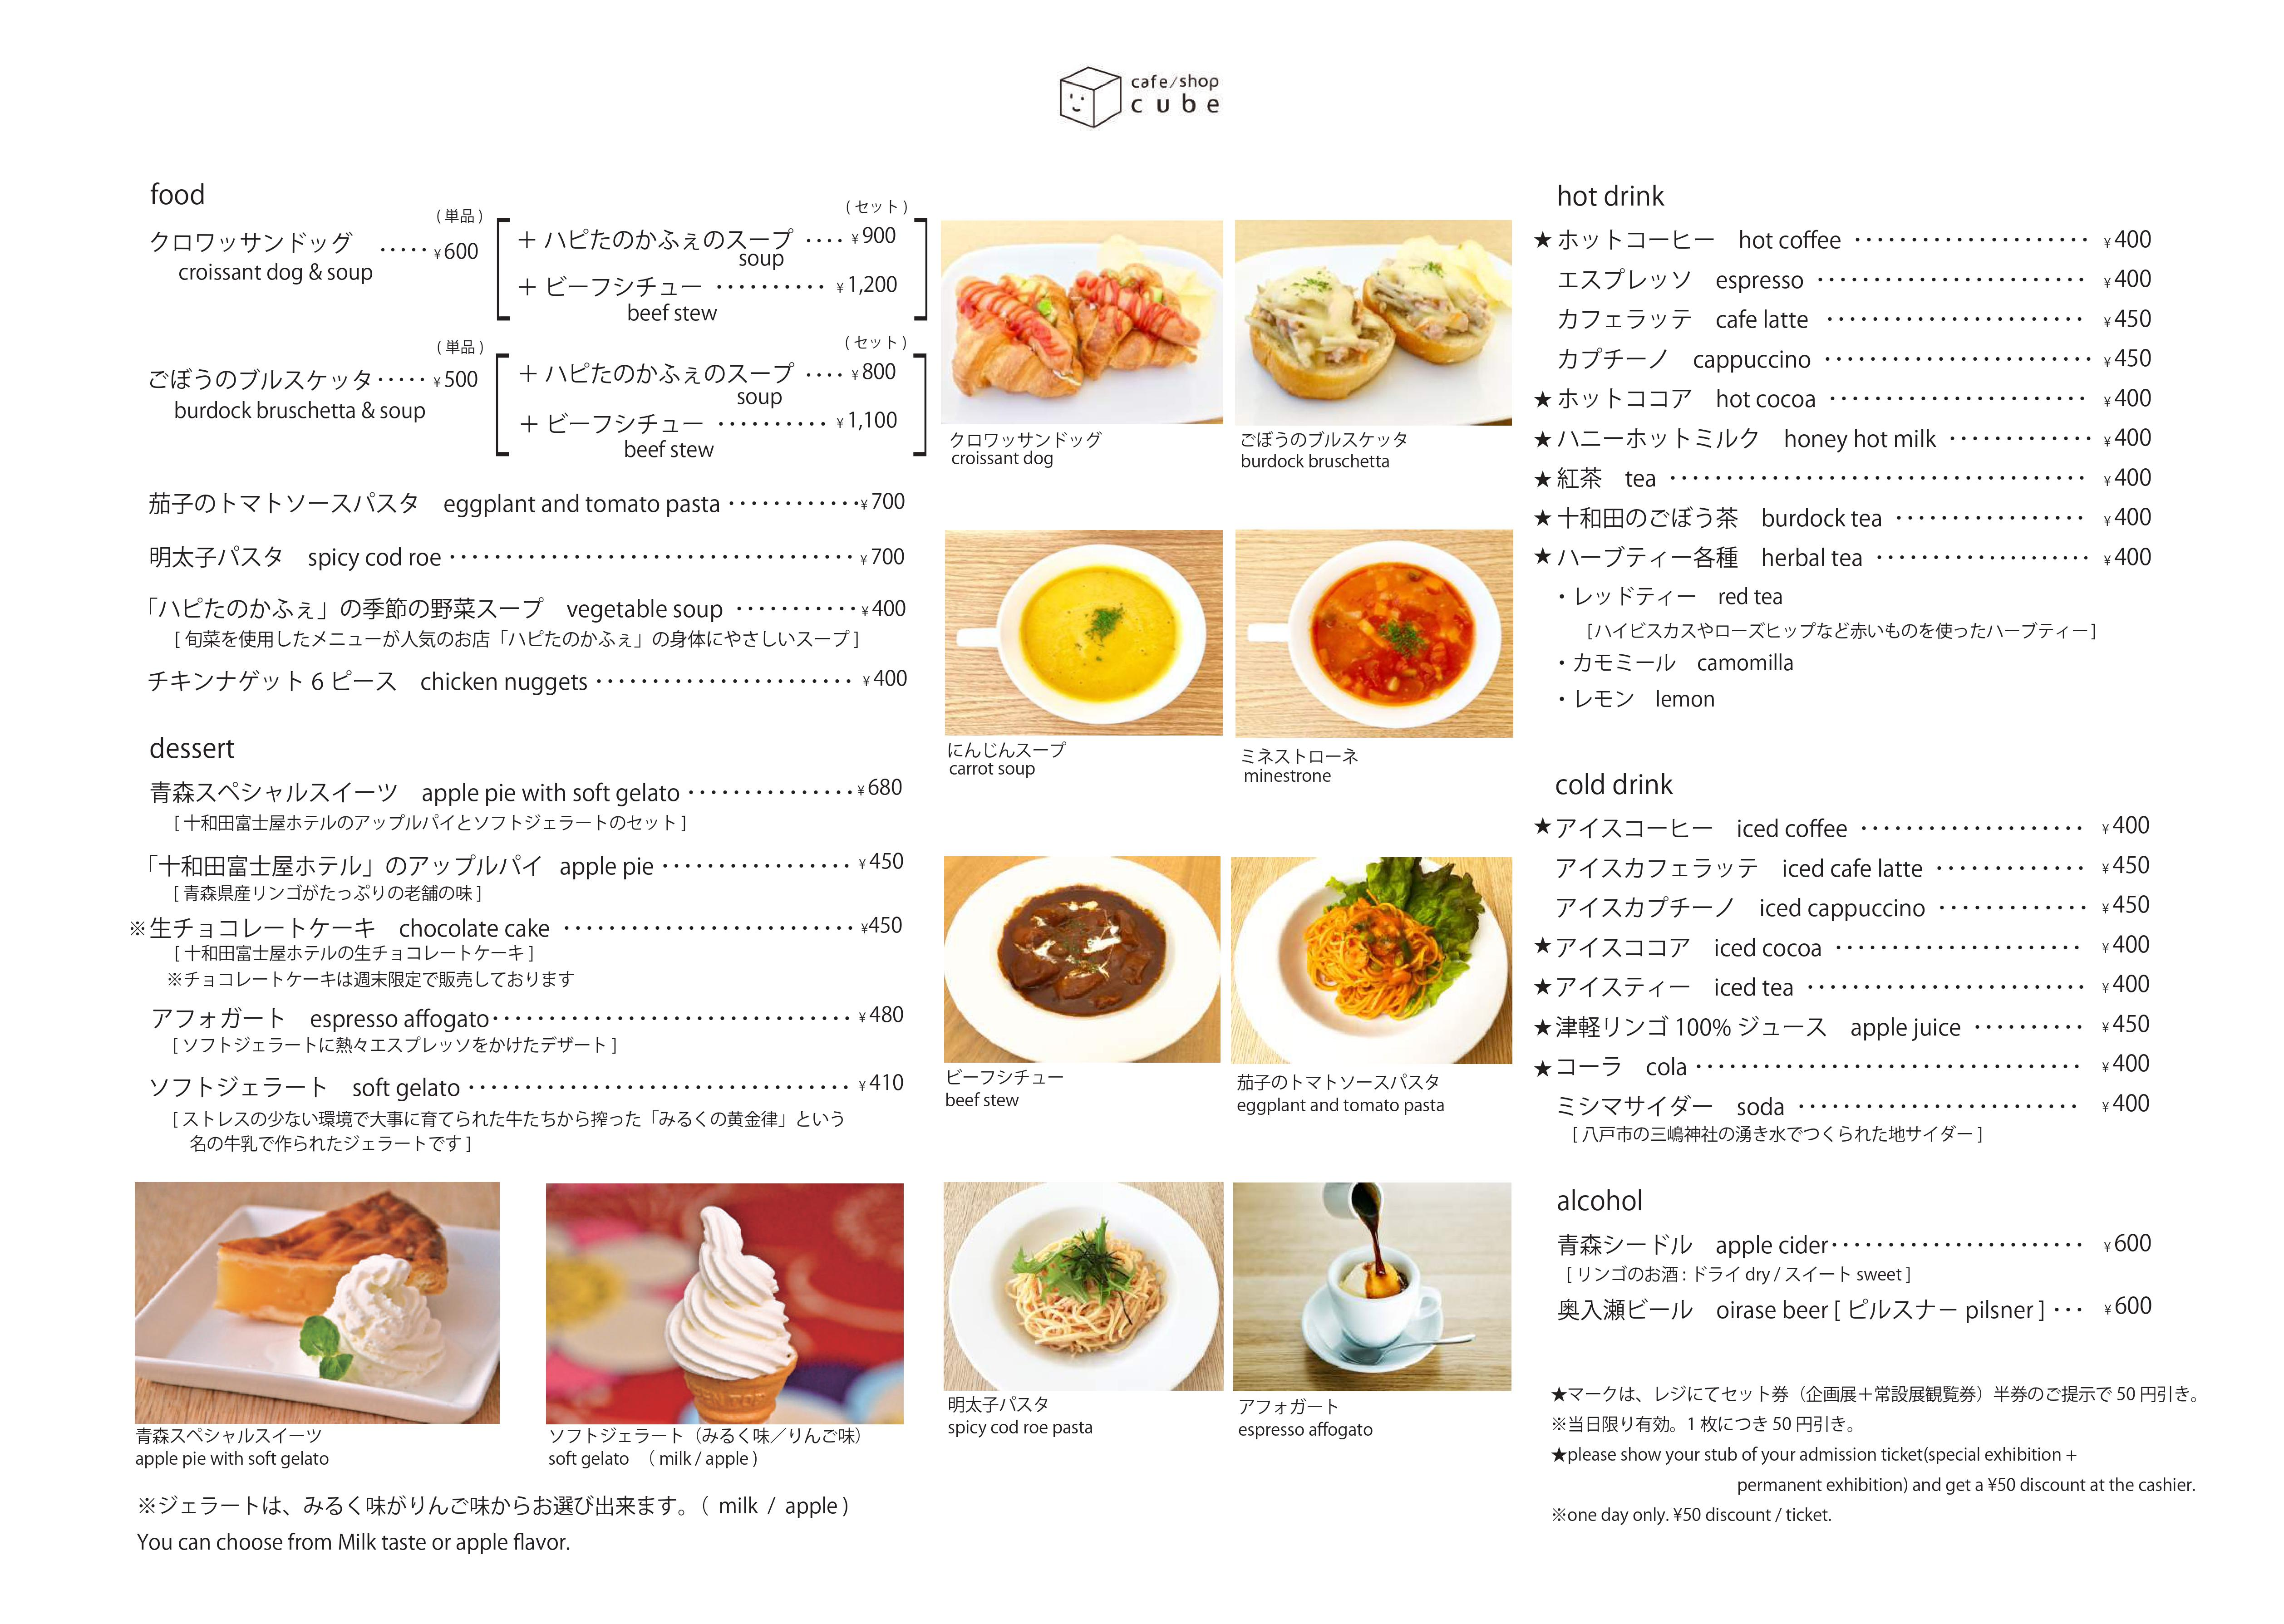 cube cafe menu 2018AW